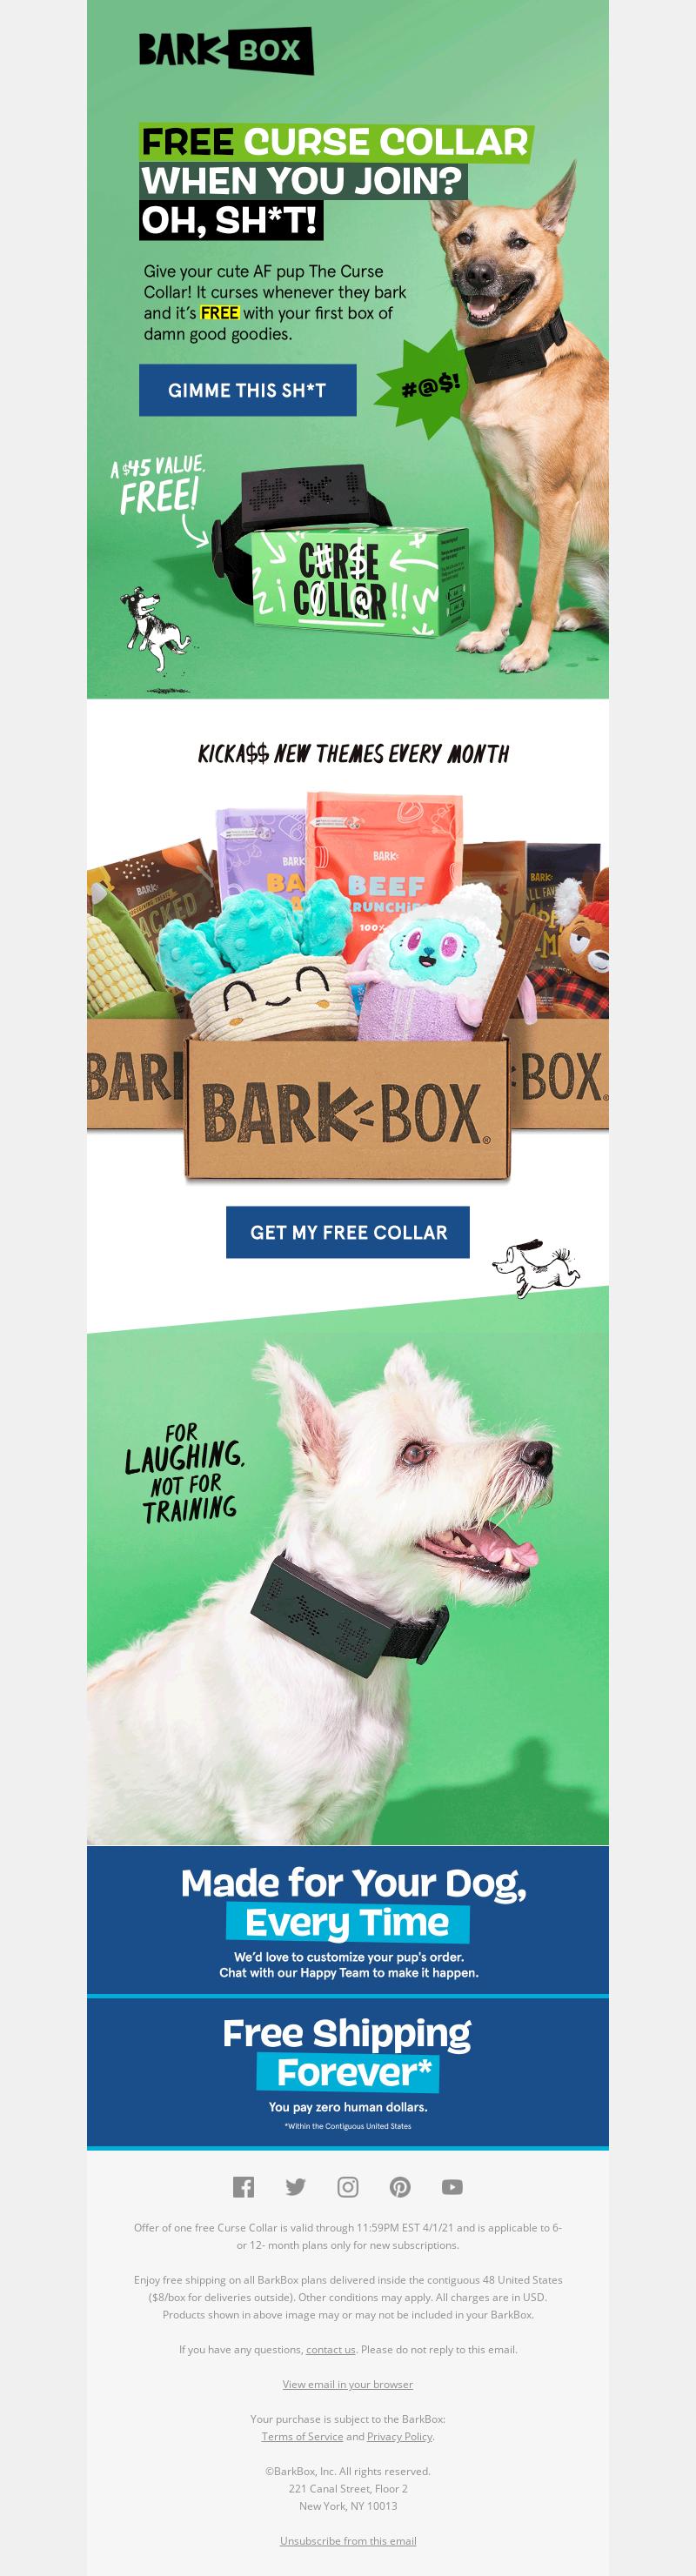 BarkBox - 🤬⚠️ FREE UPGRADE MOTHERPUPPERS